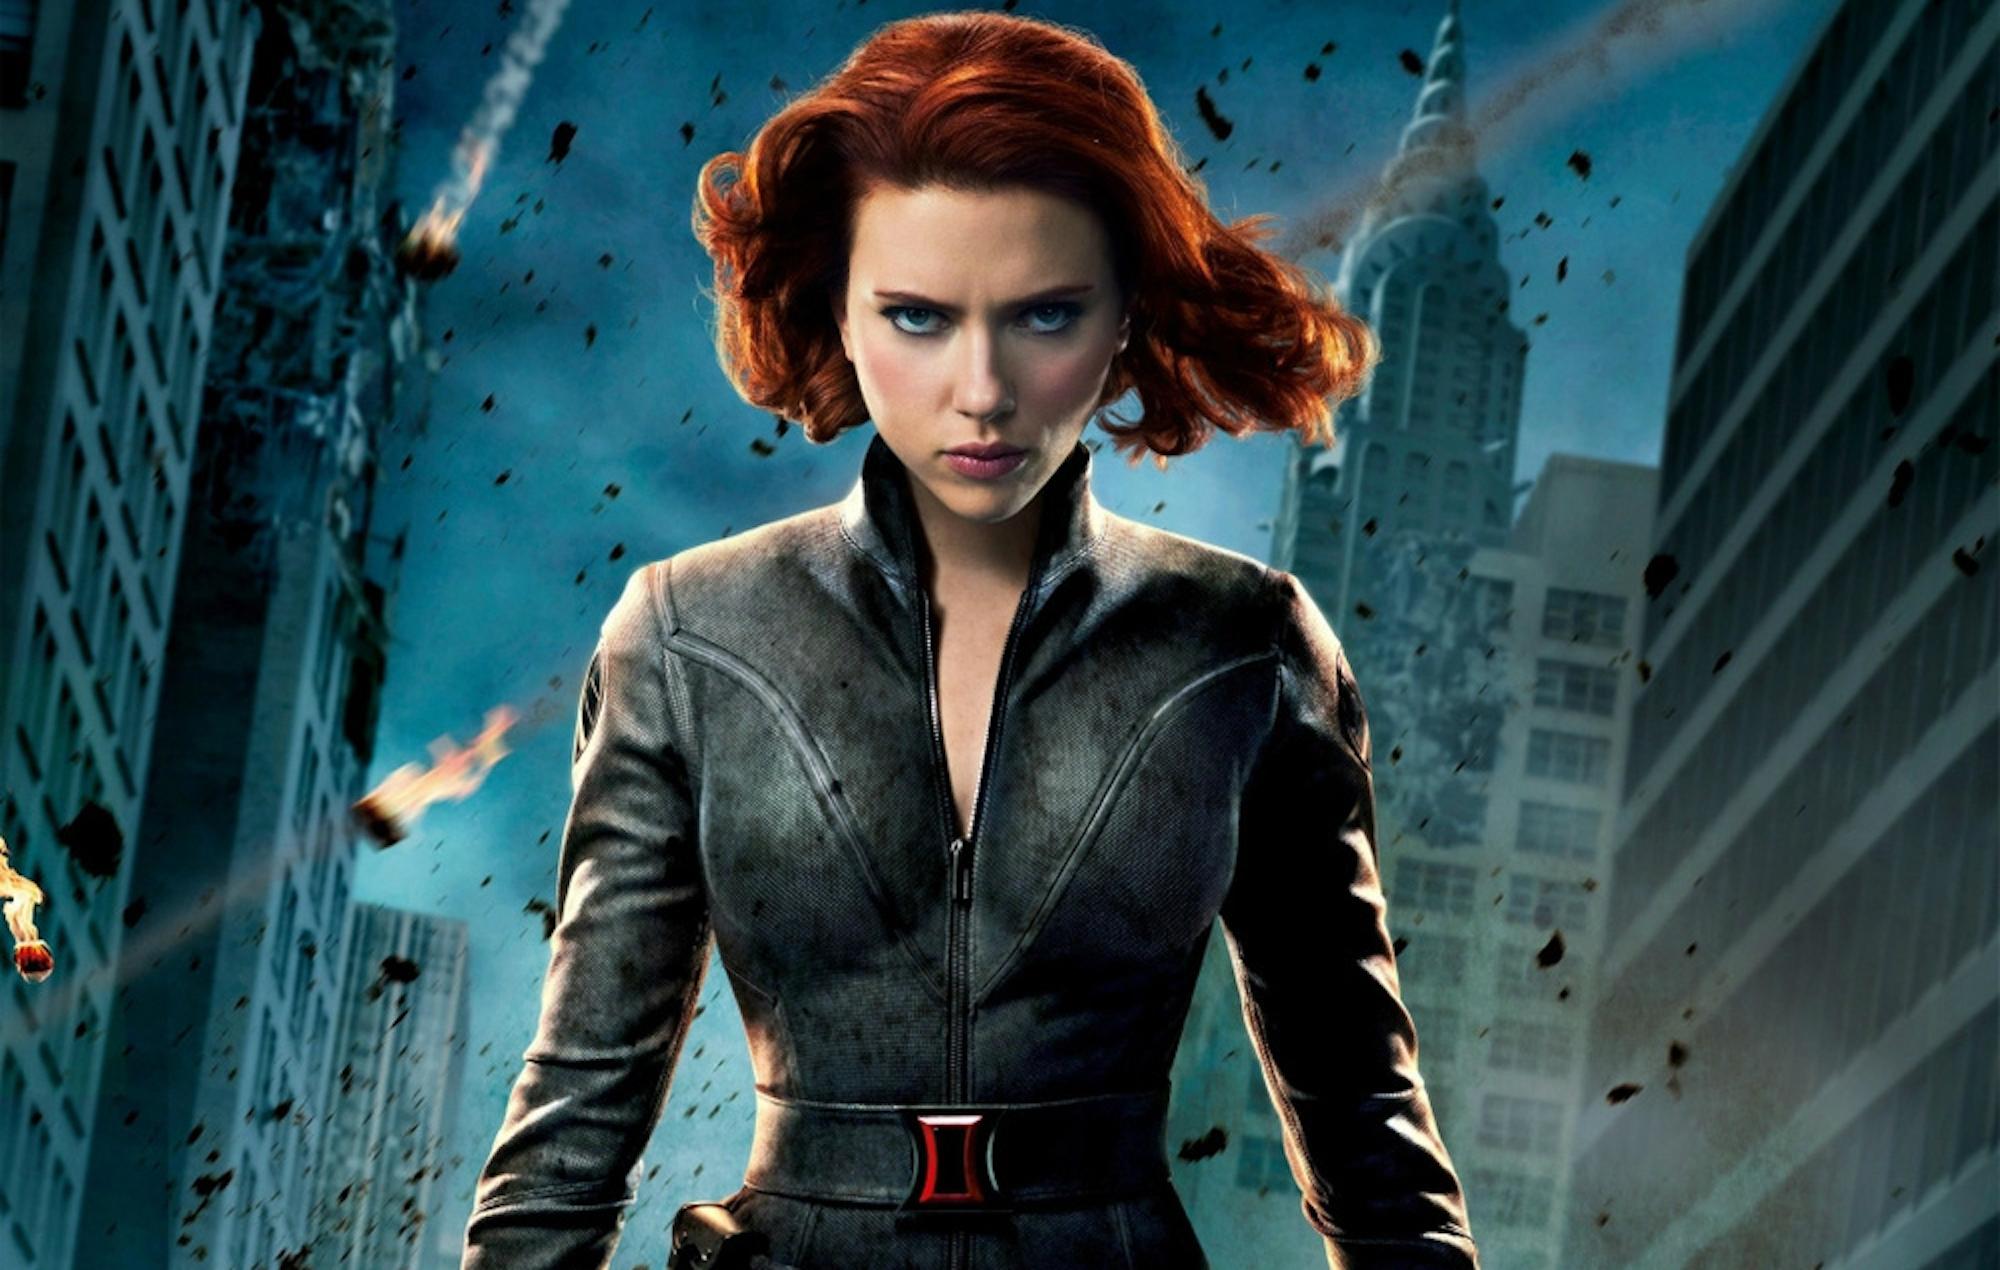 'Black Widow' set photo shows return of familiar character